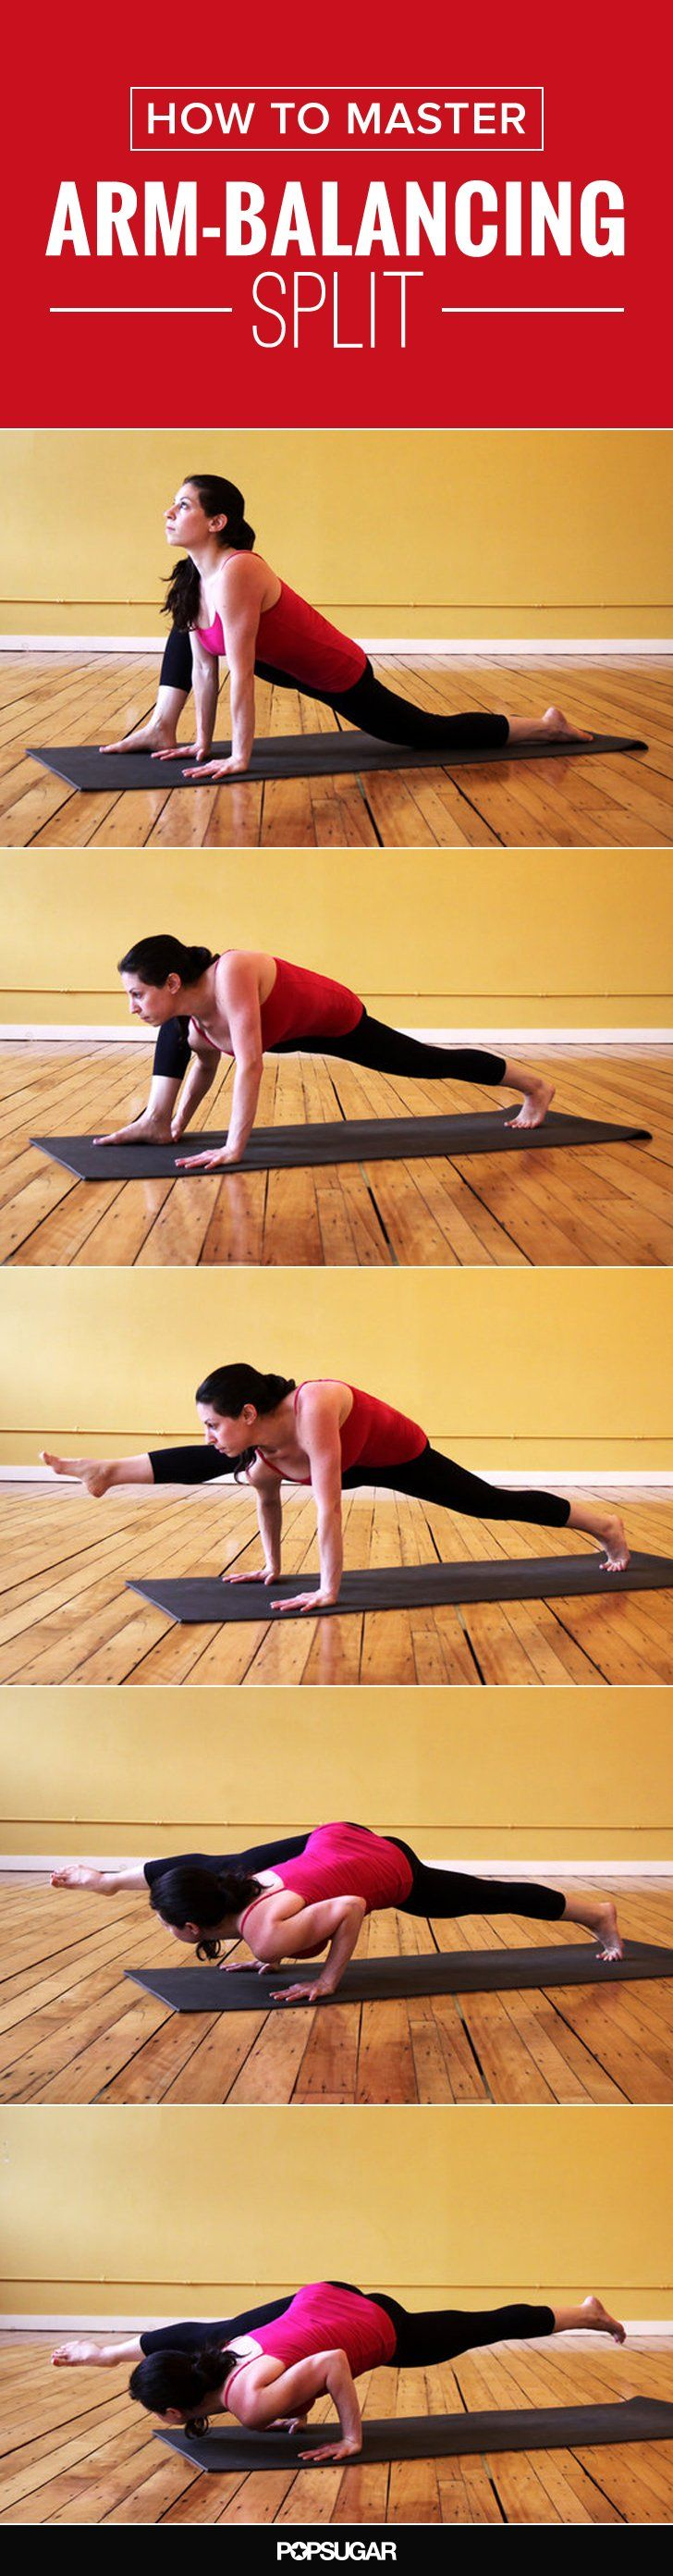 ☆ YOGA POSES ☆:  Yoga Takes Flight! Arm-Balancing Split.